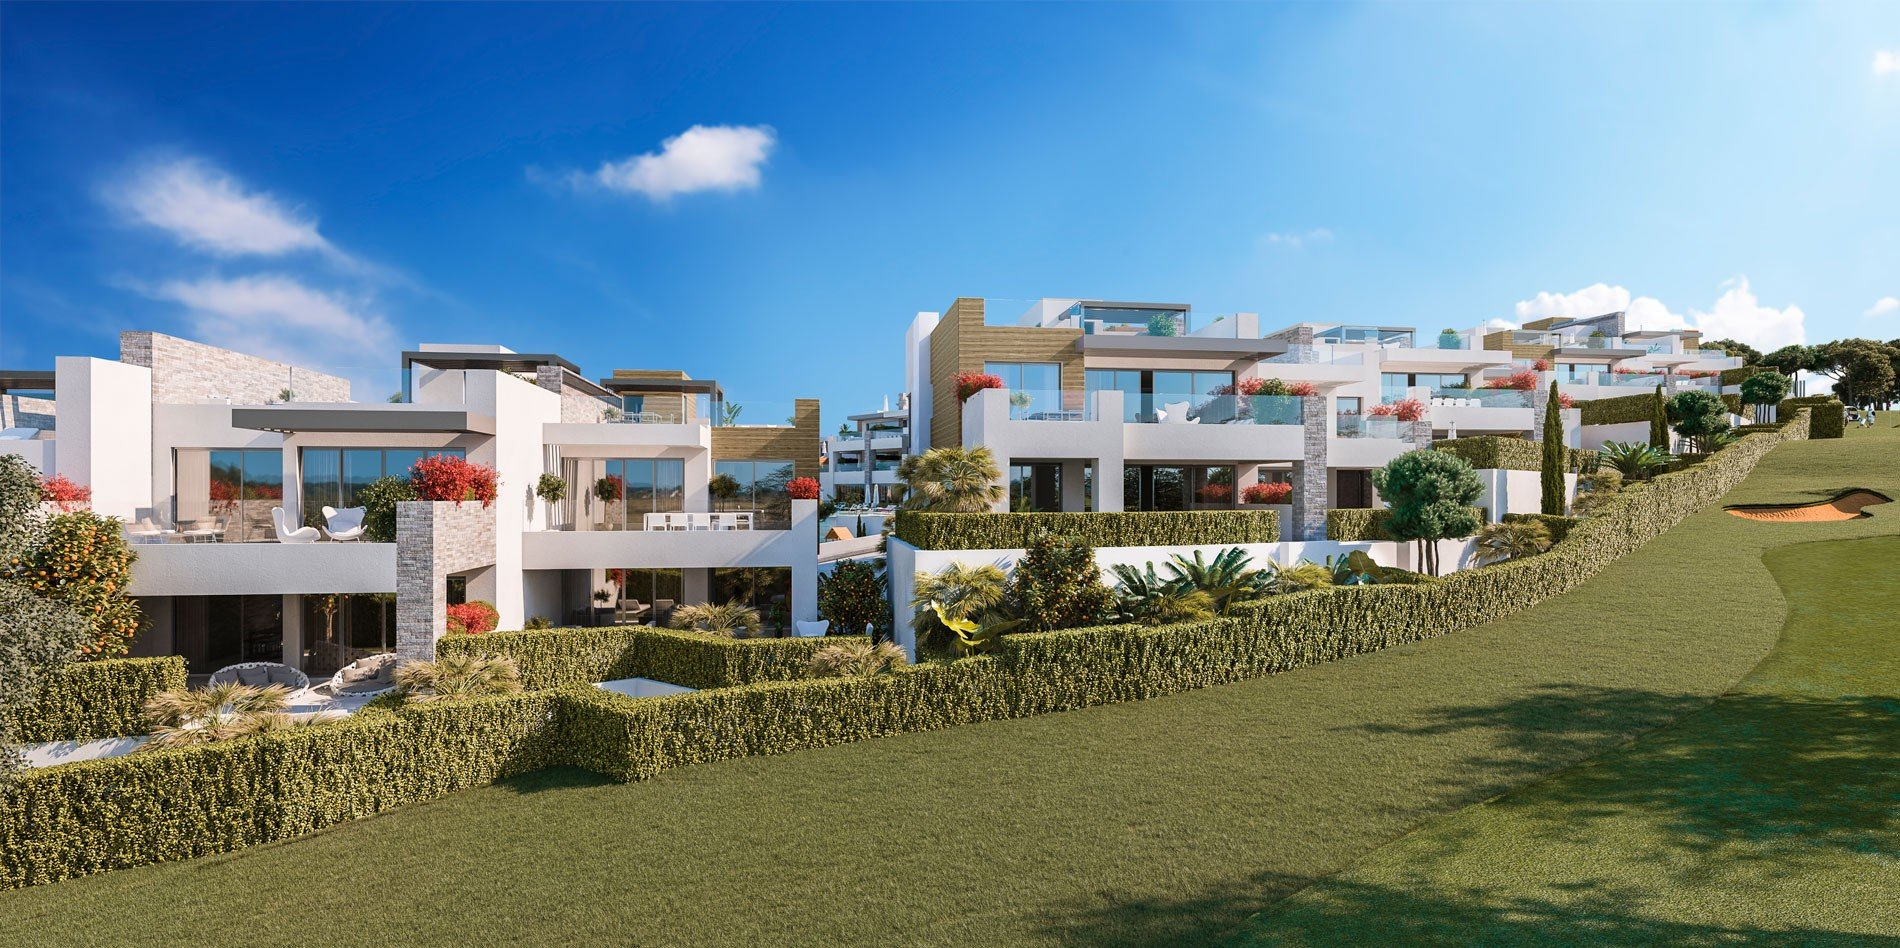 Apartment till salu i Marbella, Cabopino